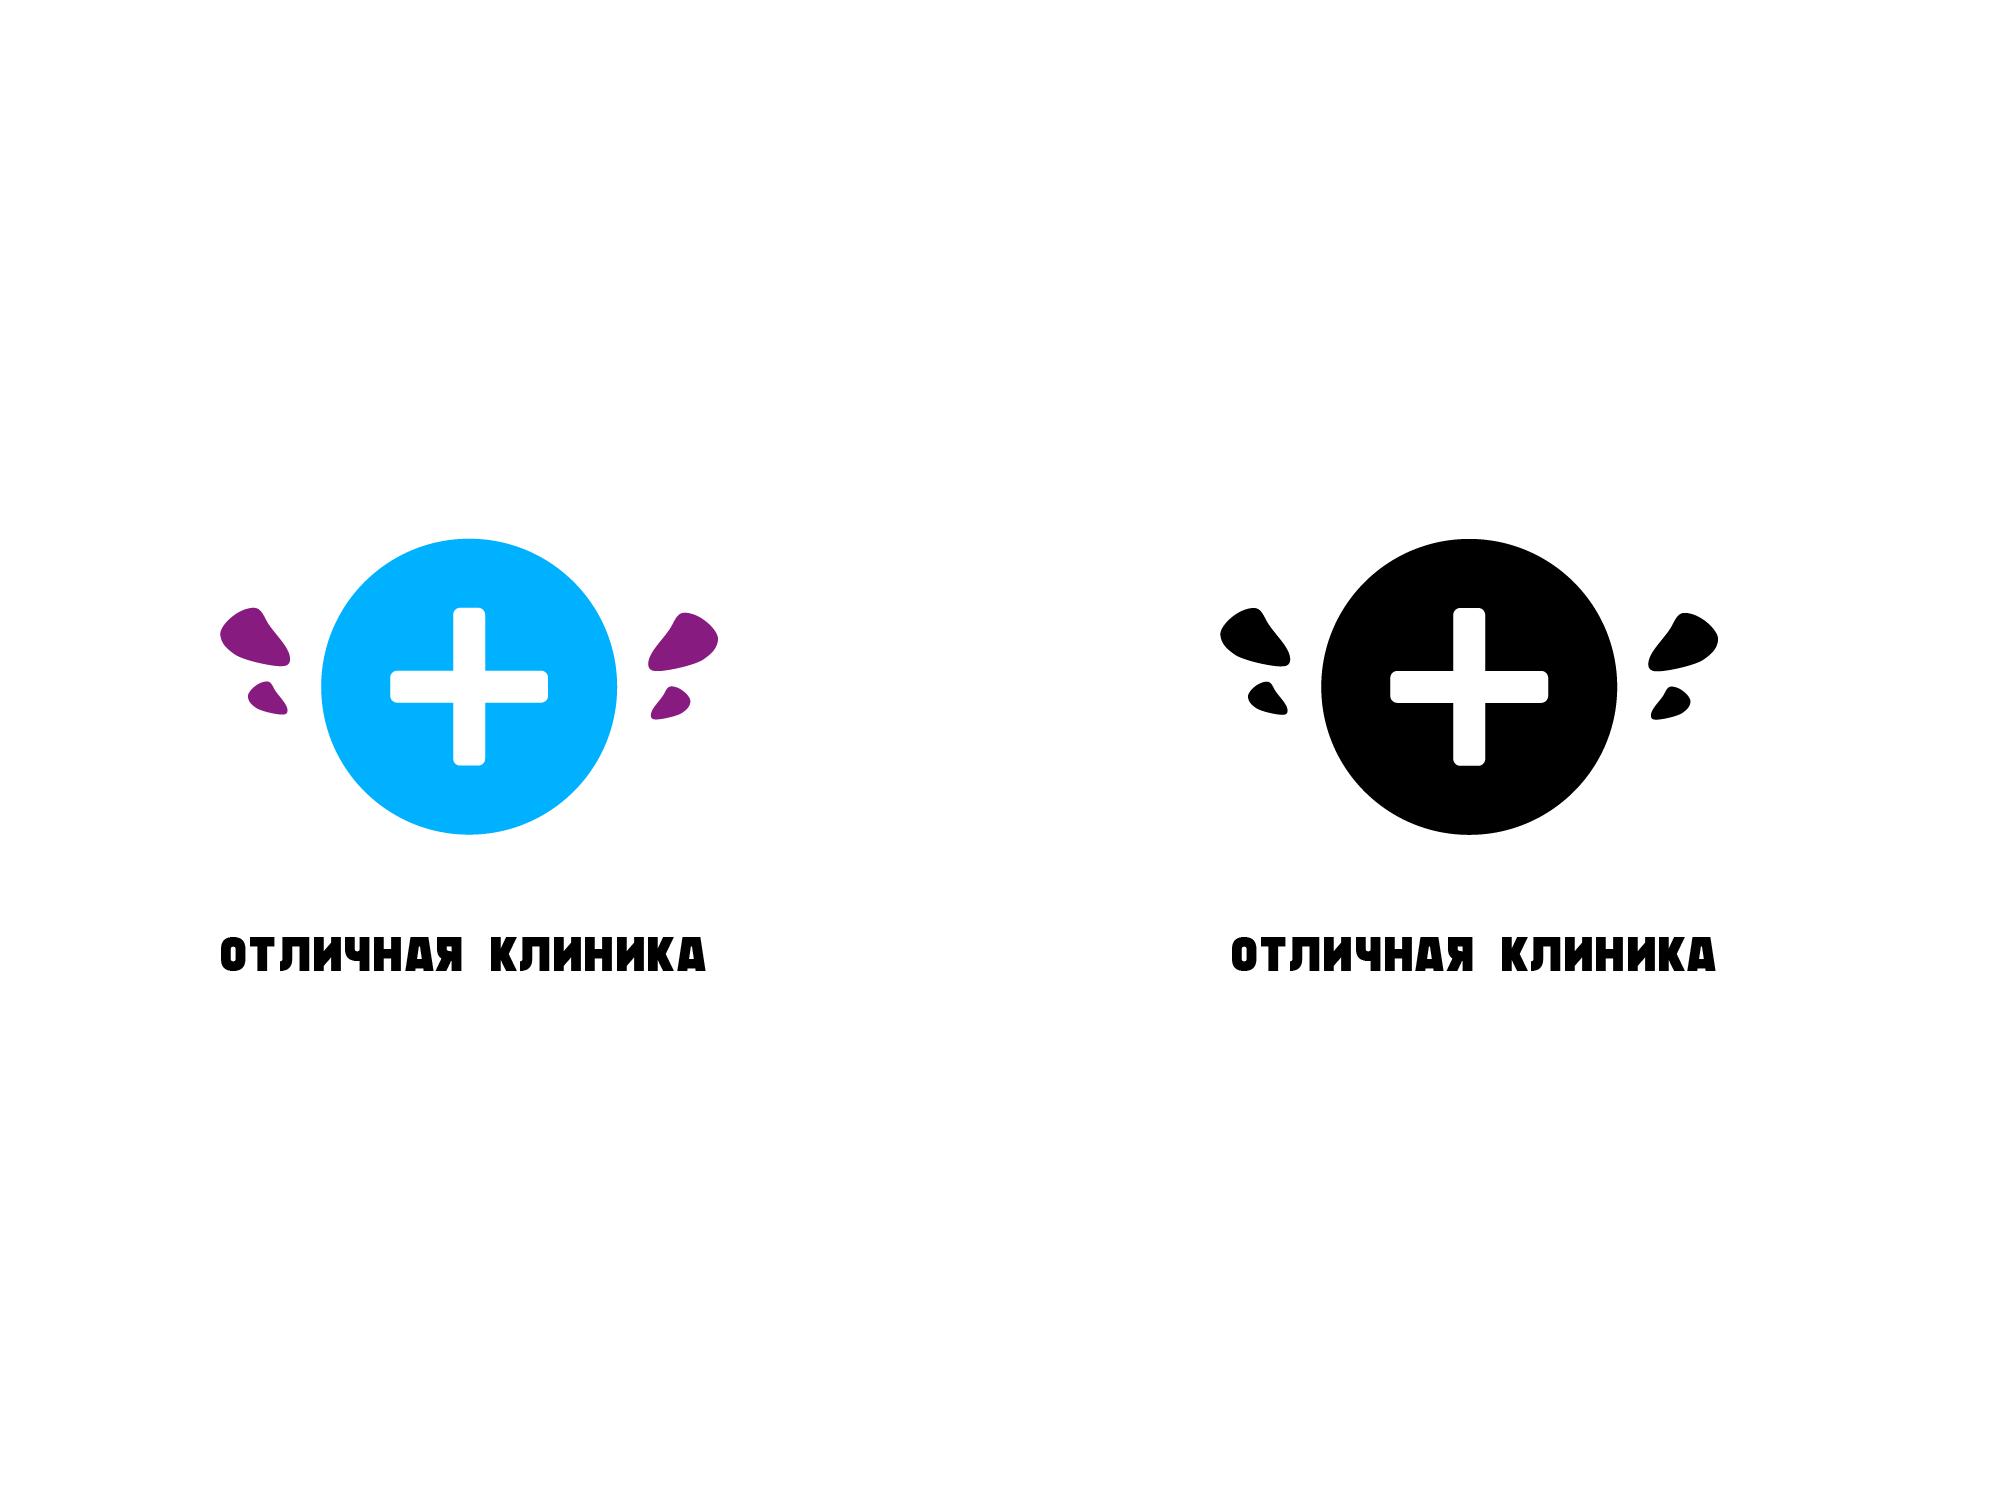 Логотип и фирменный стиль частной клиники фото f_4875c8e53dcdf750.png